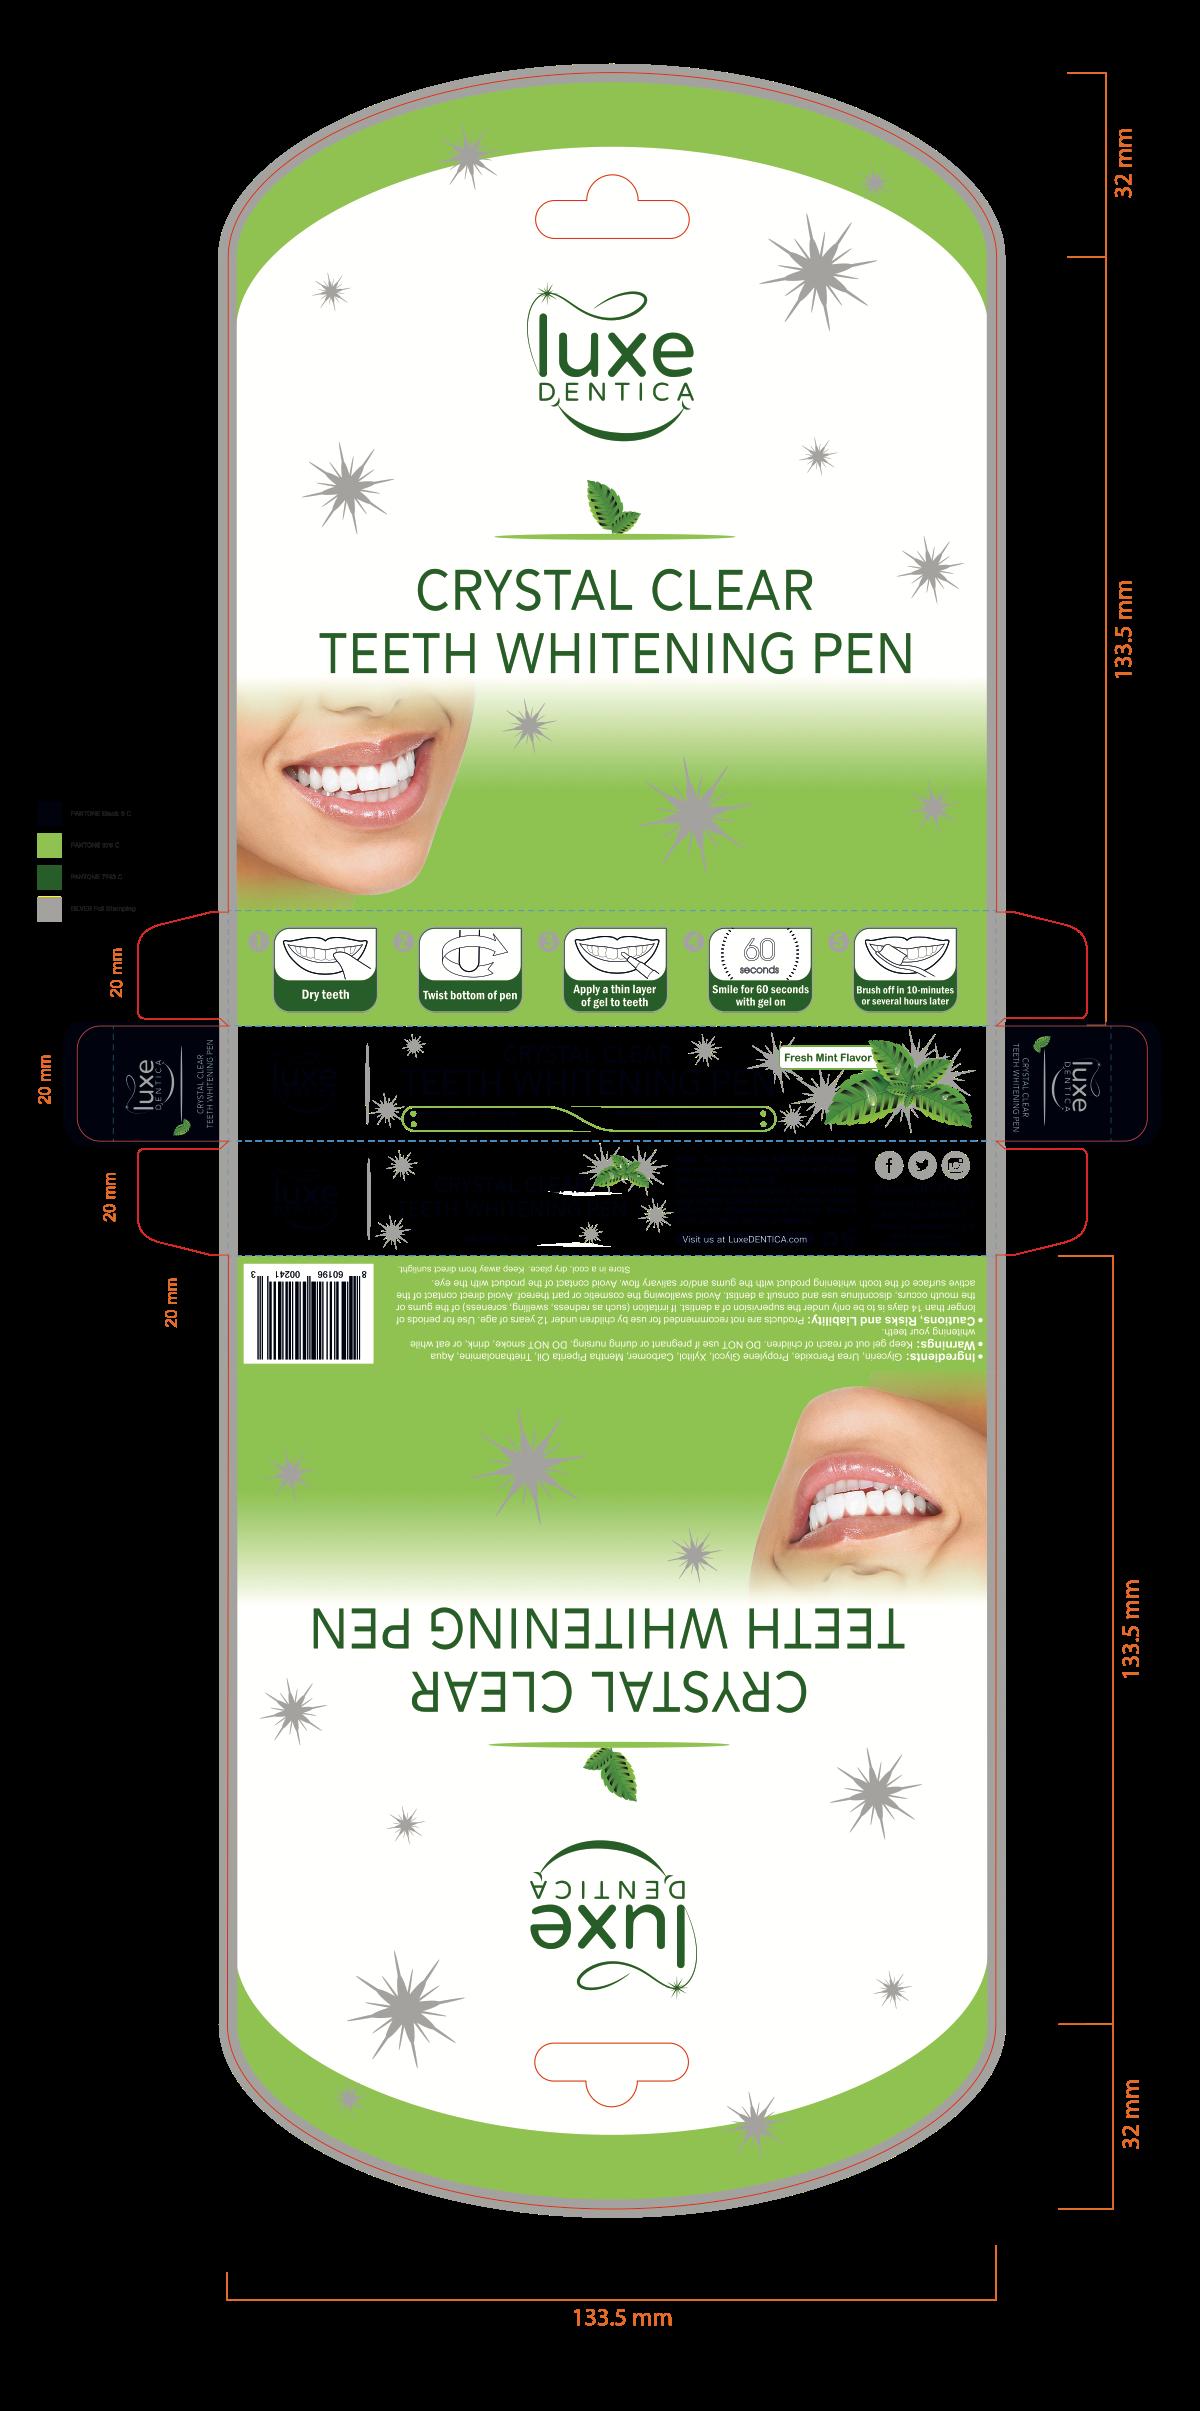 Supplementary package for Teeth Whitening Pen